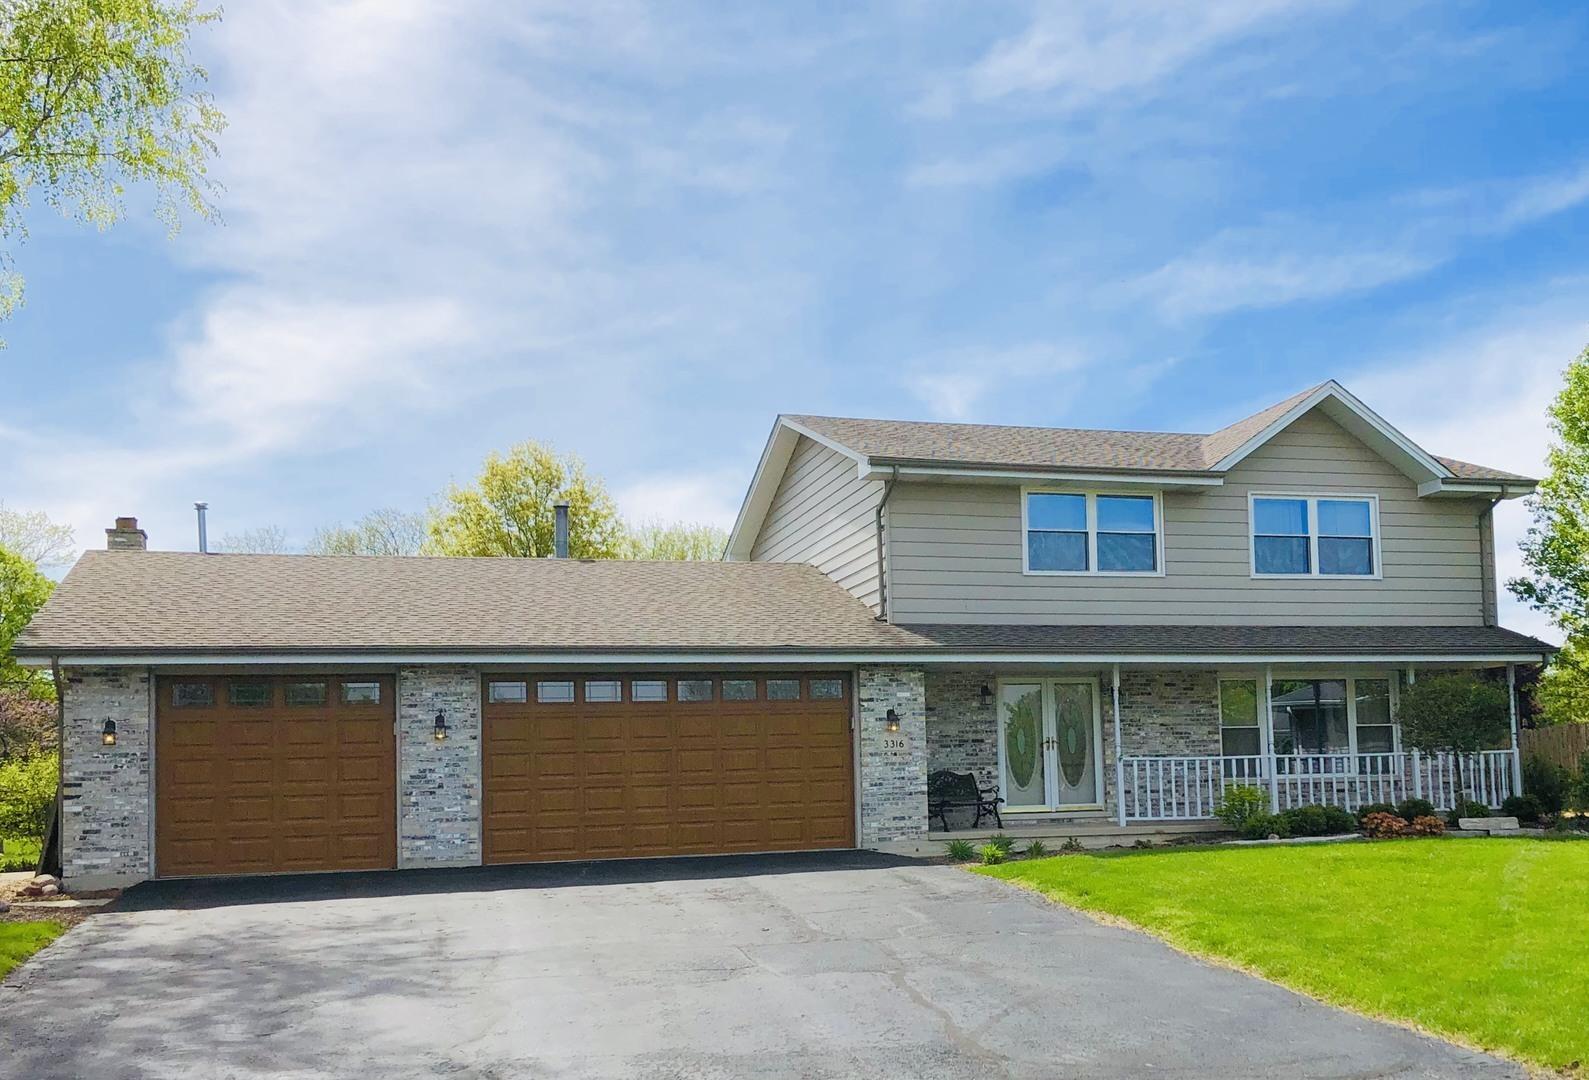 3316 Edgecreek Drive, New Lenox, Illinois